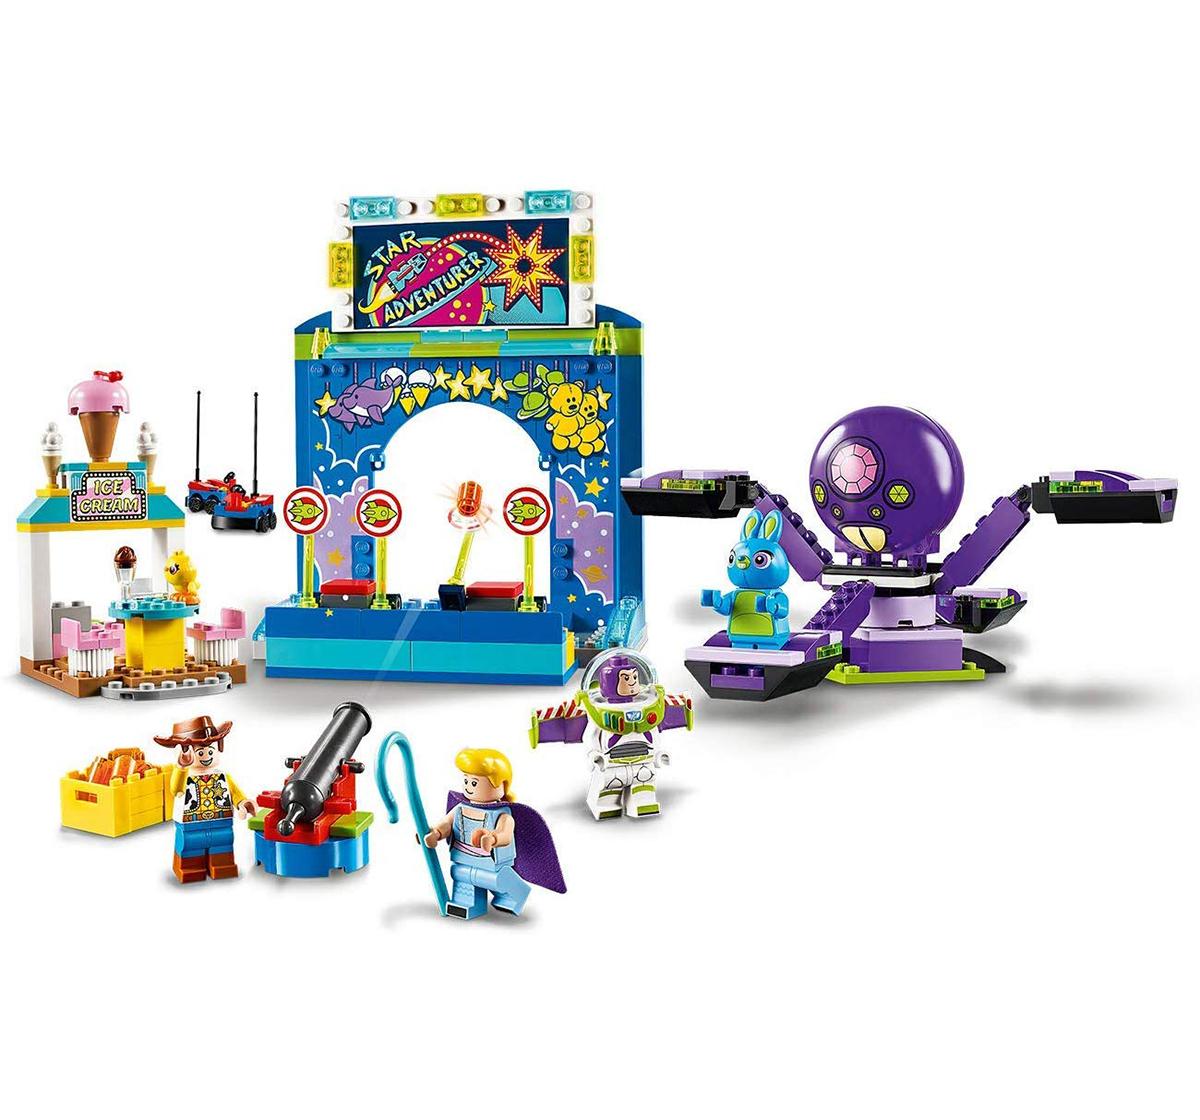 LEGO |  Lego 10770 Buzz & Woody'S Carnival Mania!  Blocks for Kids age 4Y+